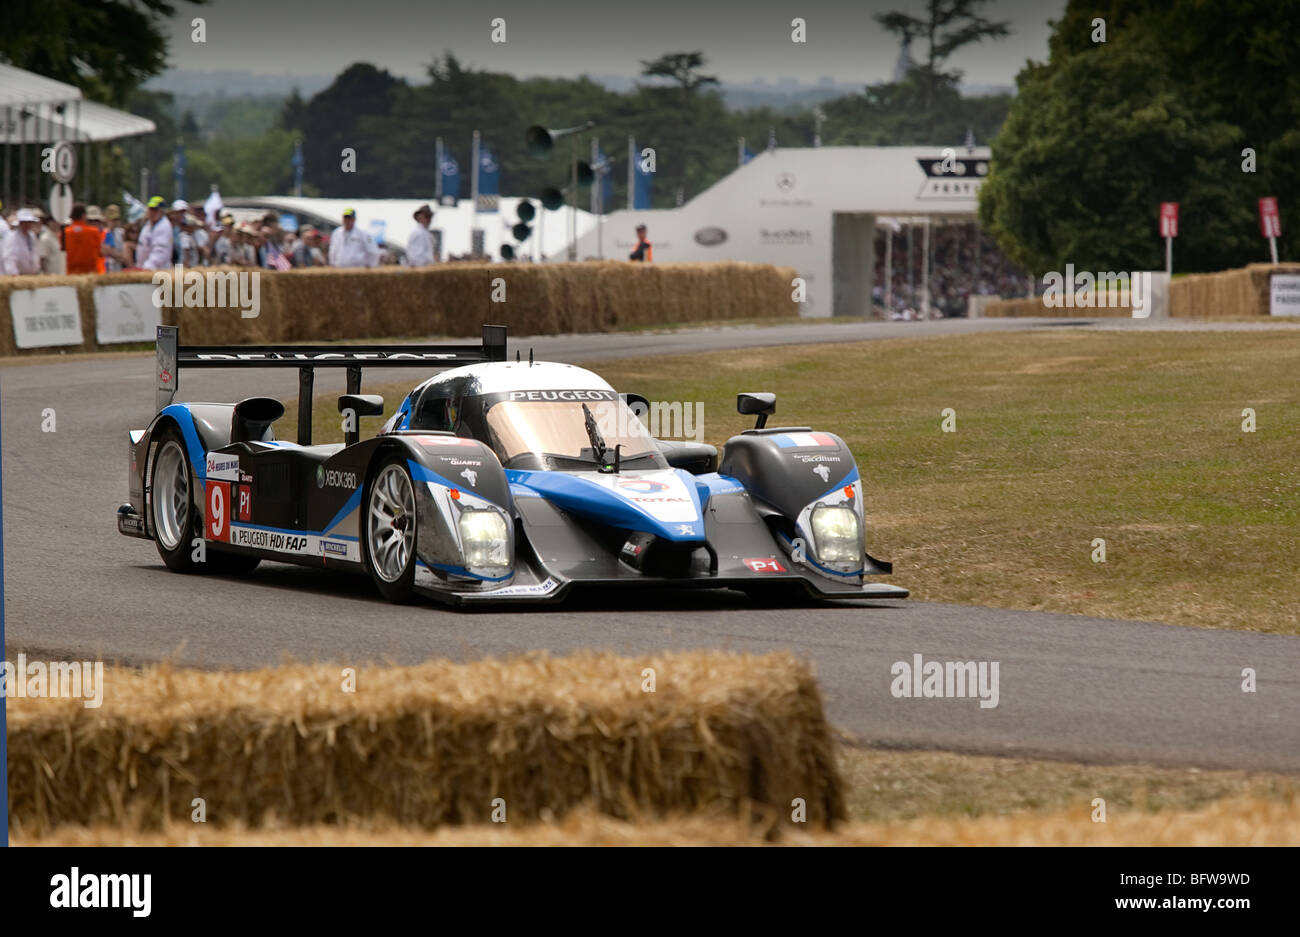 Peugeot 908 HDi FAP. 2009 Le Mans winner. - Stock Image